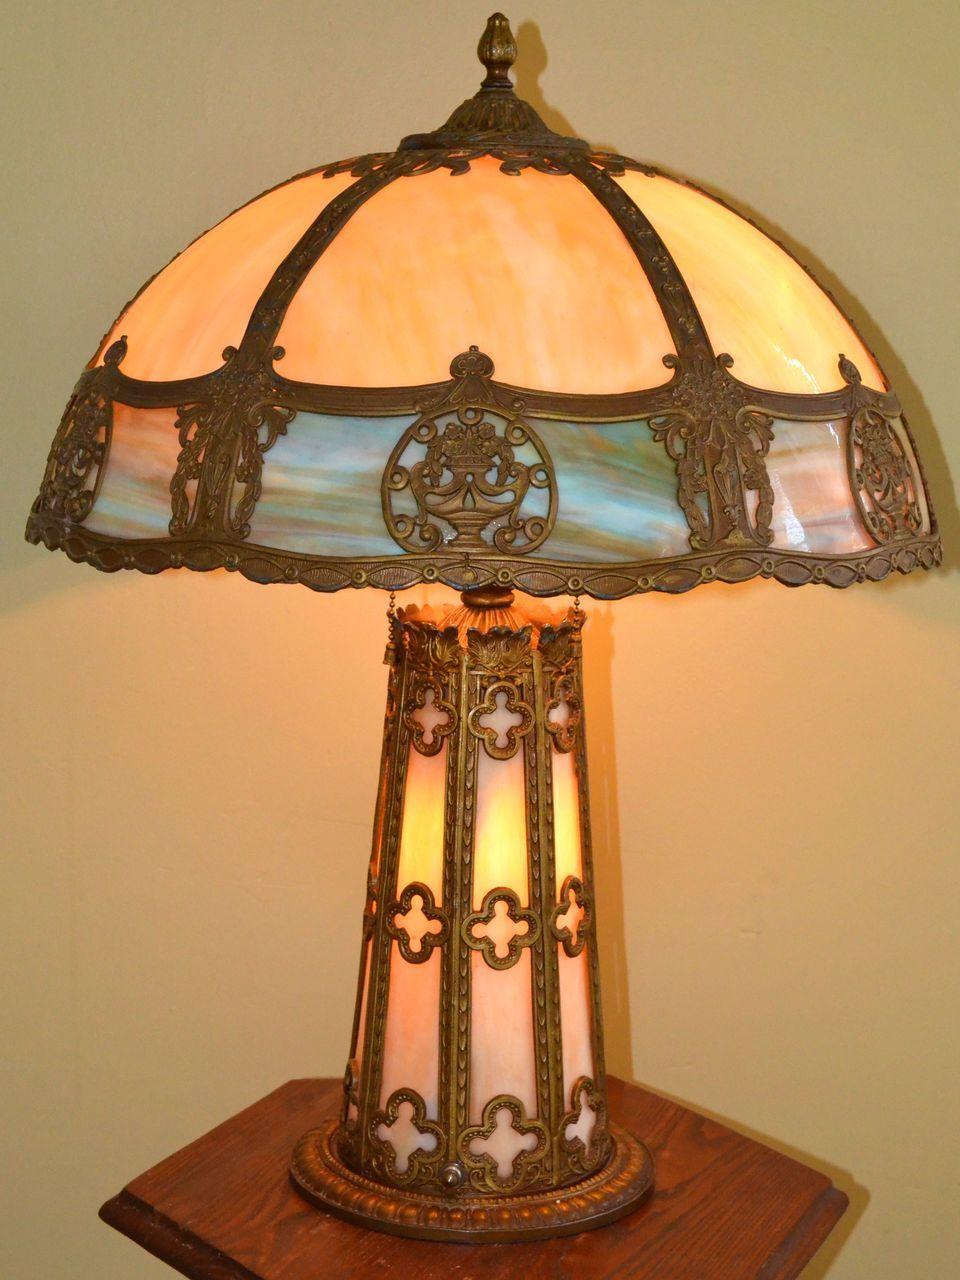 Ornate Slag Glass Lamp With Lighted Base Slag Glass Table Lamps